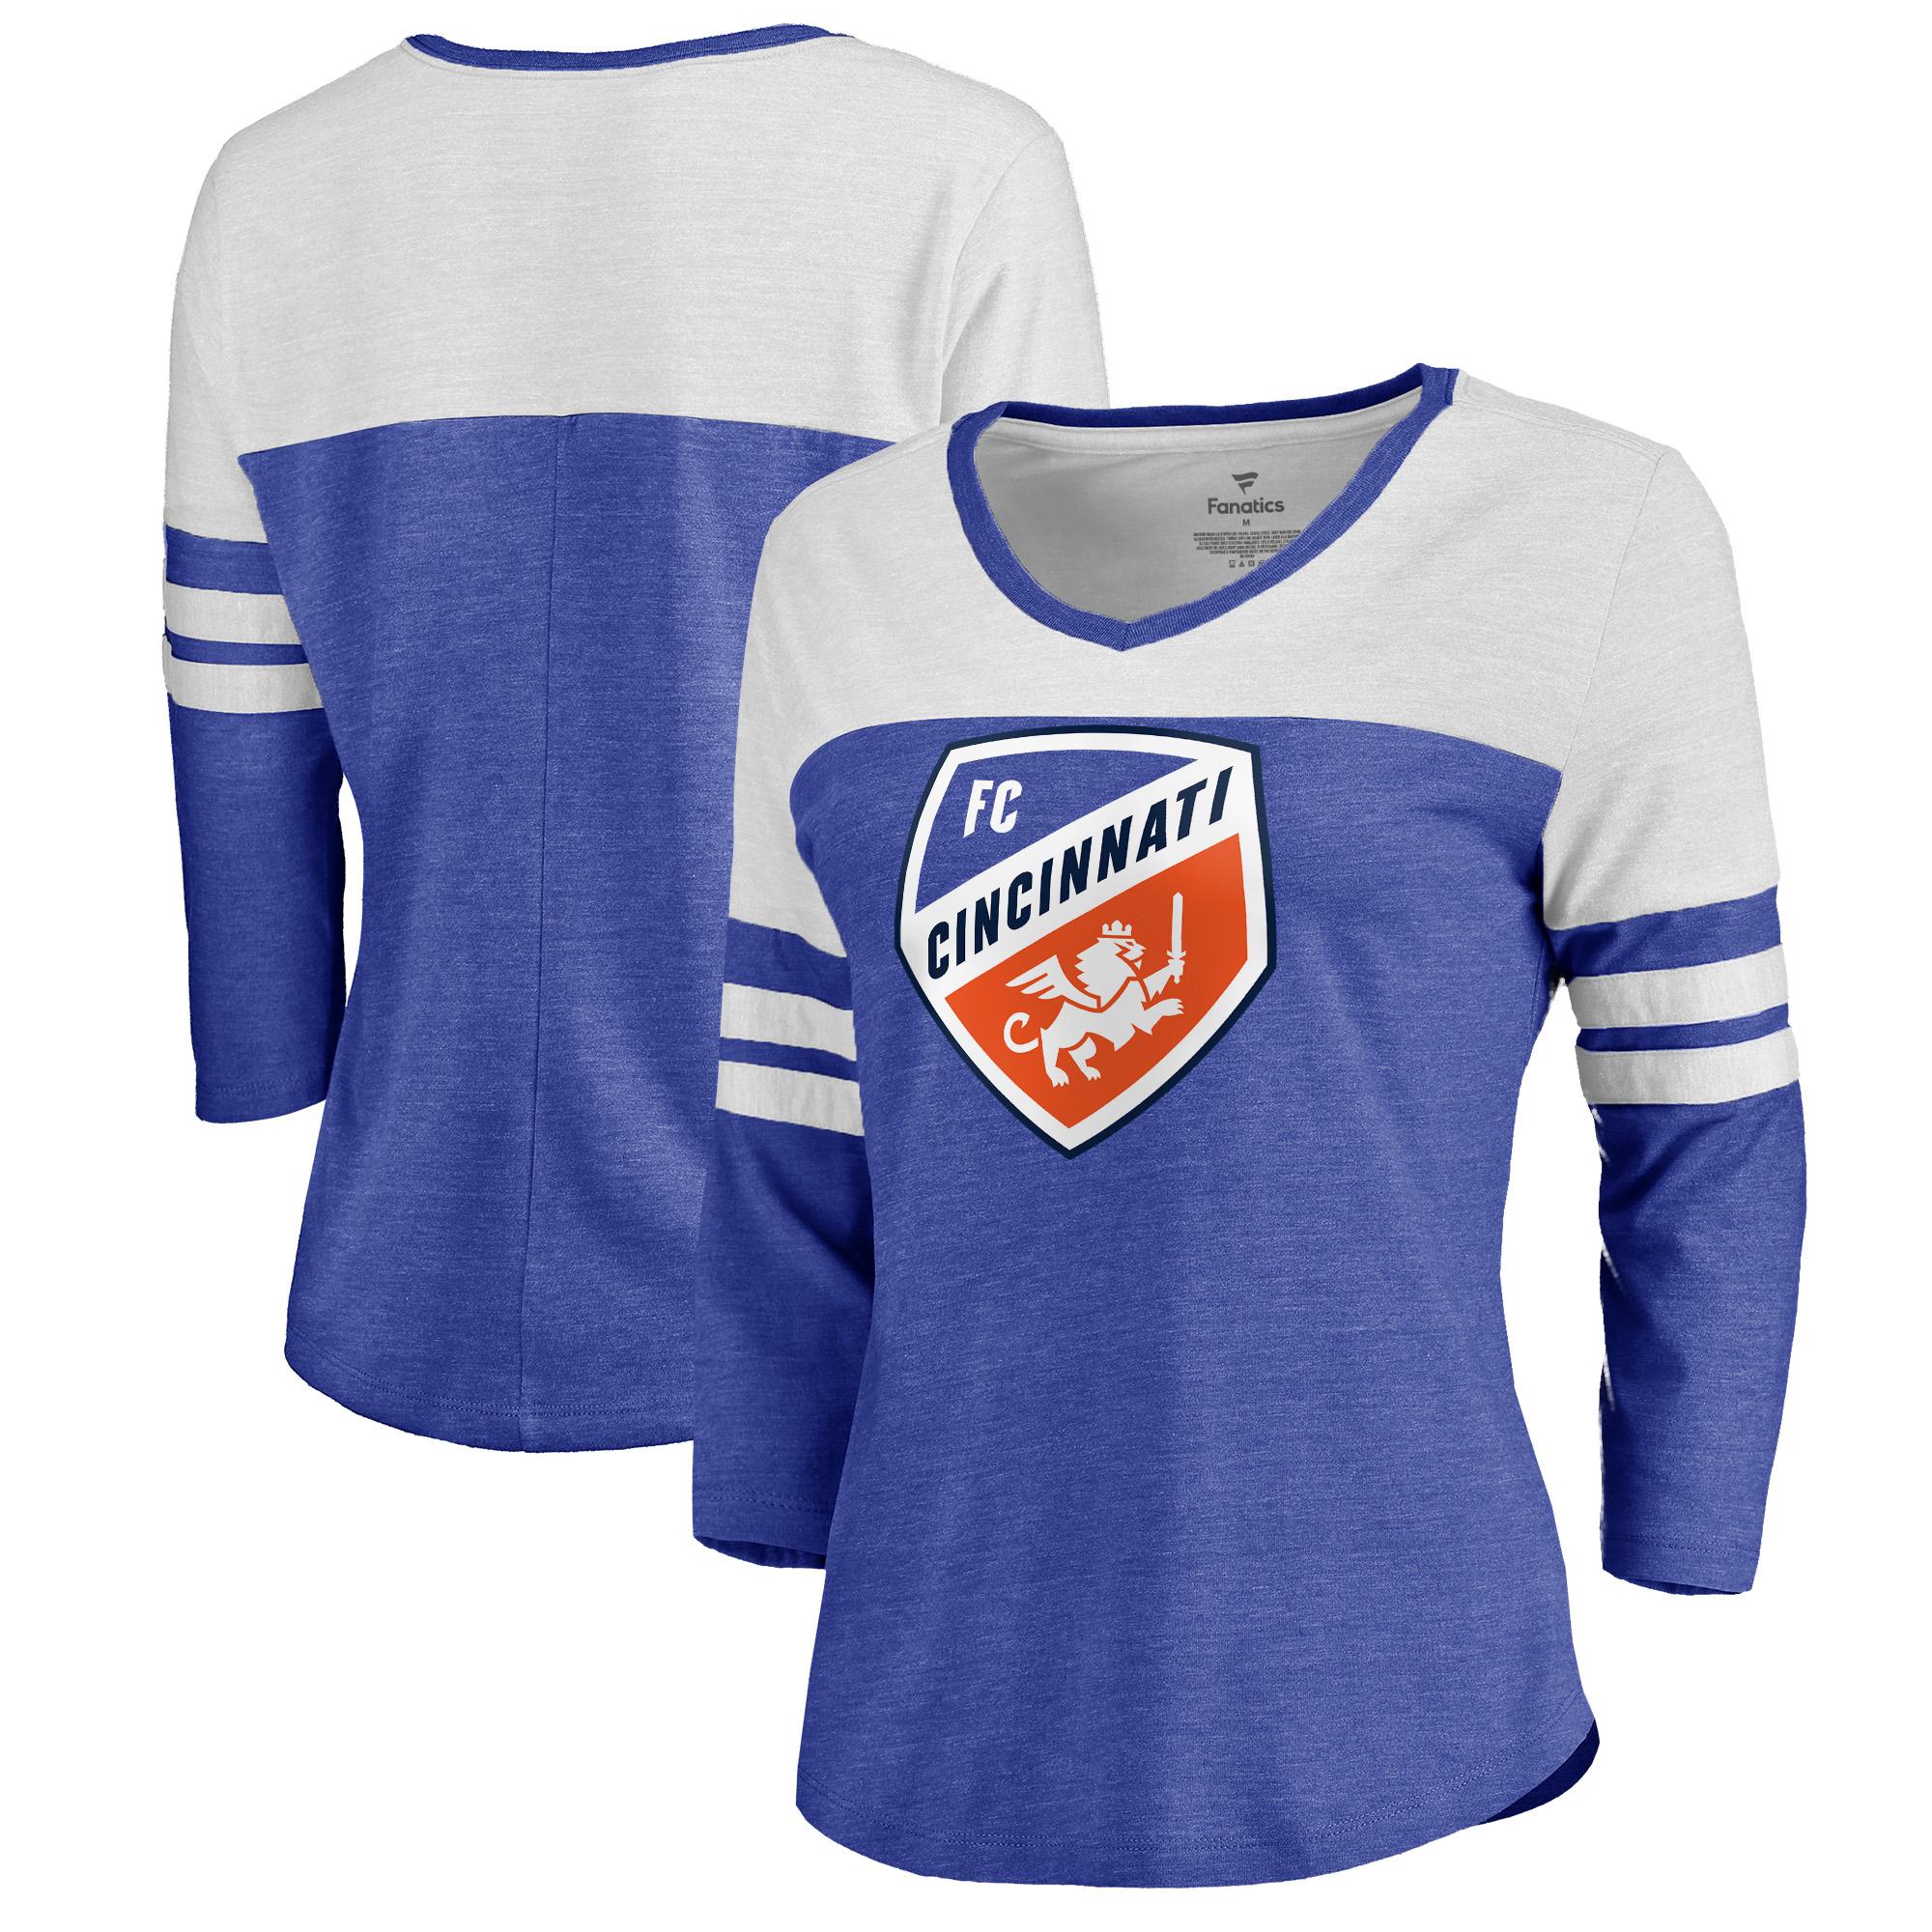 FC Cincinnati Fanatics Branded Women's Primary Logo Color Block Tri-Blend 3/4-Sleeve T-Shirt - Royal